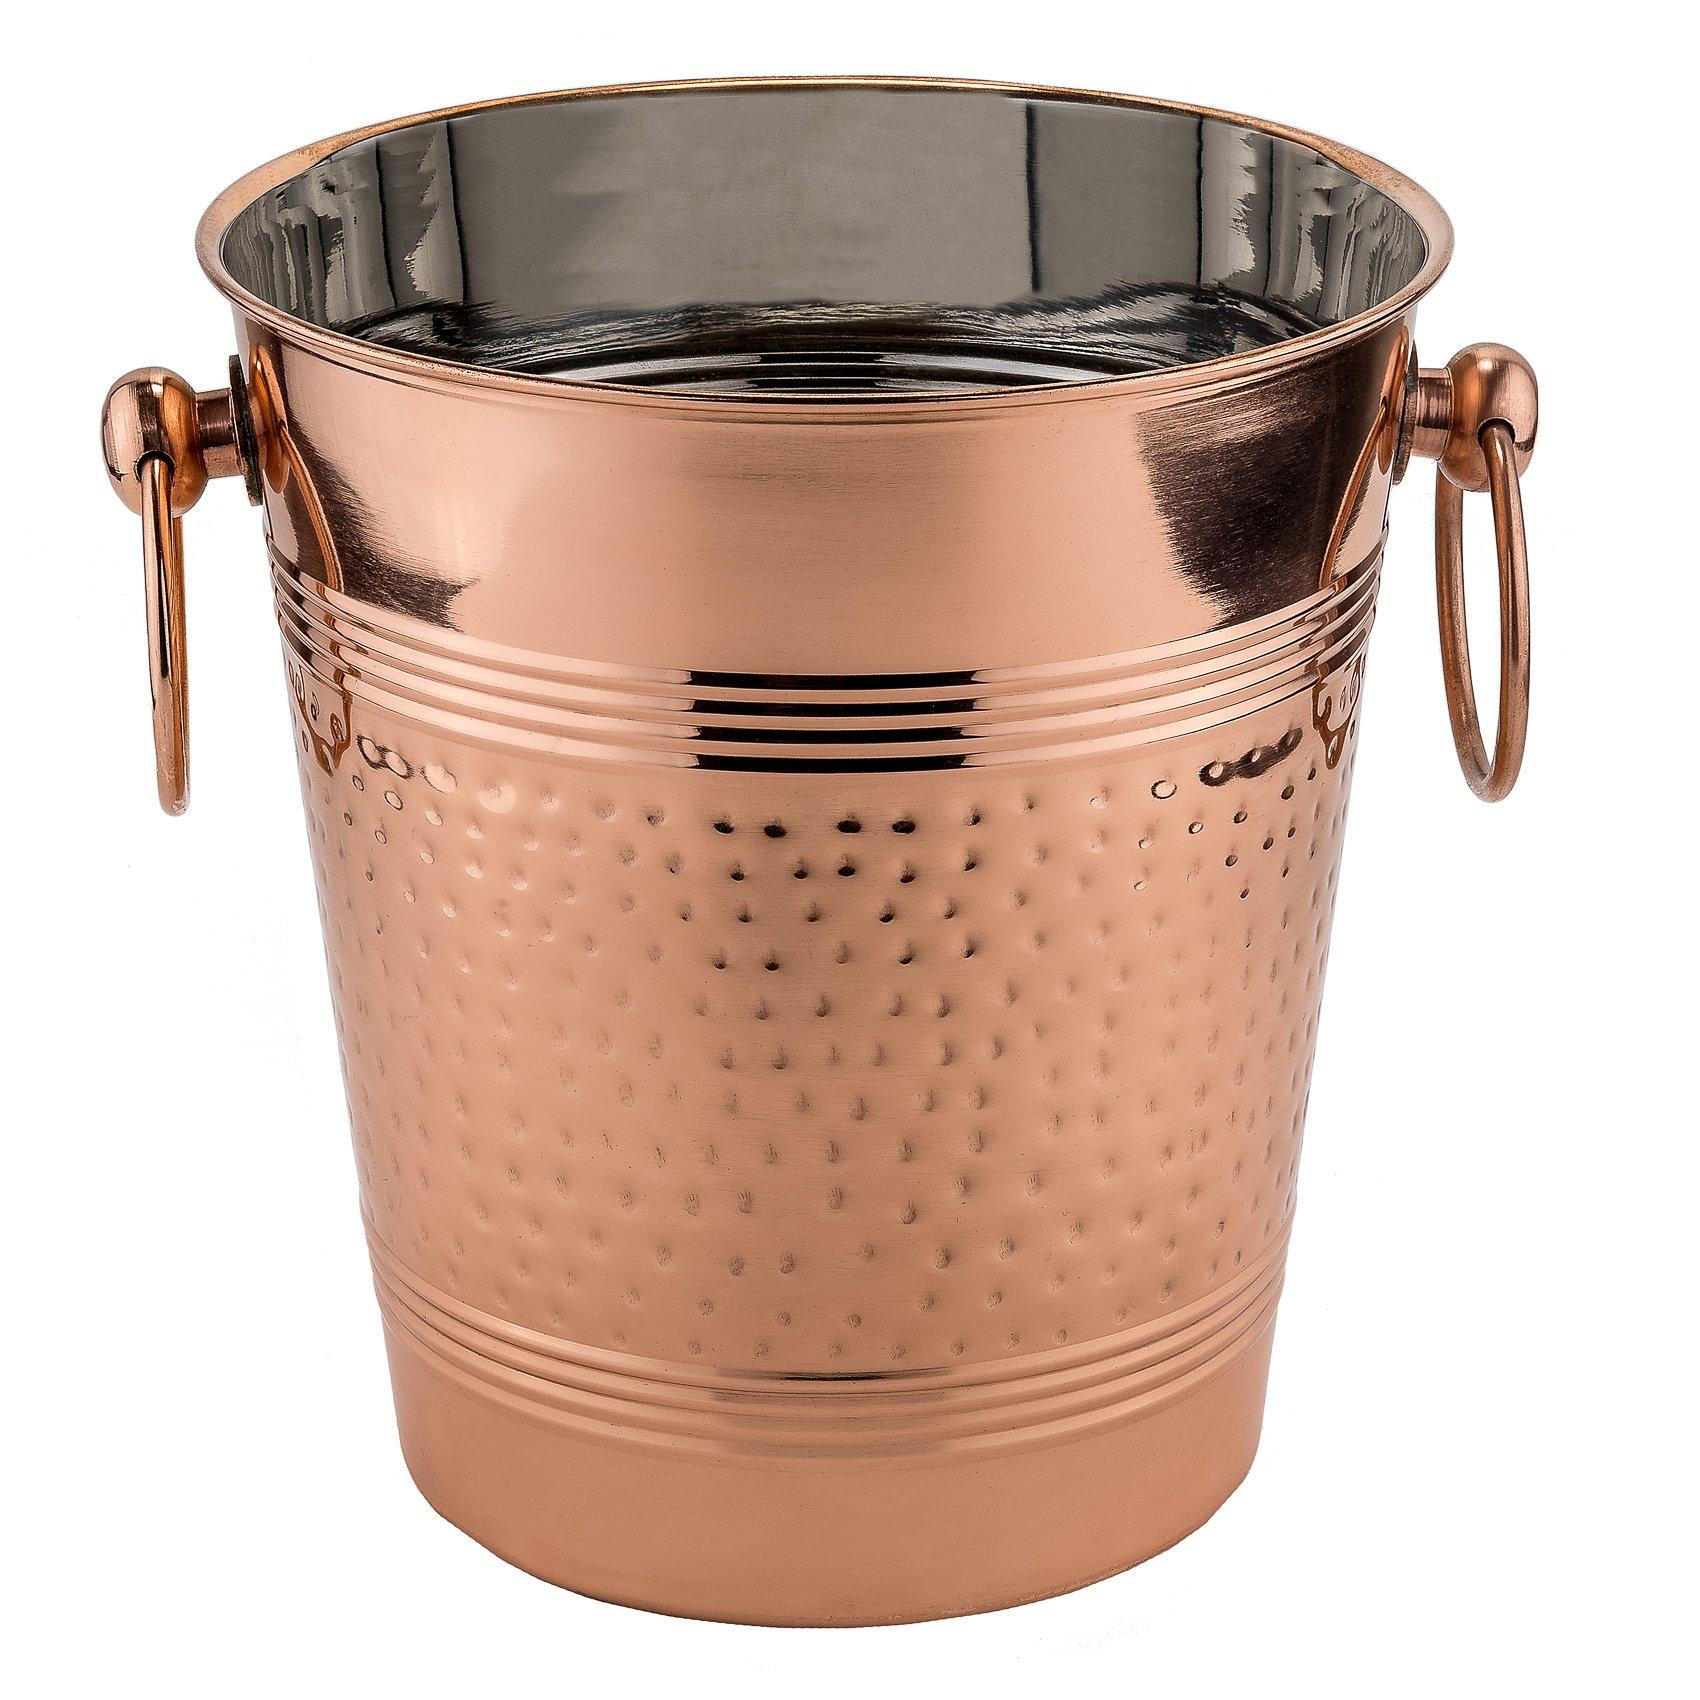 Old Dutch 1104 ''Fez'' Decor Copper Hammered Wine Cooler, Copper 9.25'' x 8'' x 8.25''